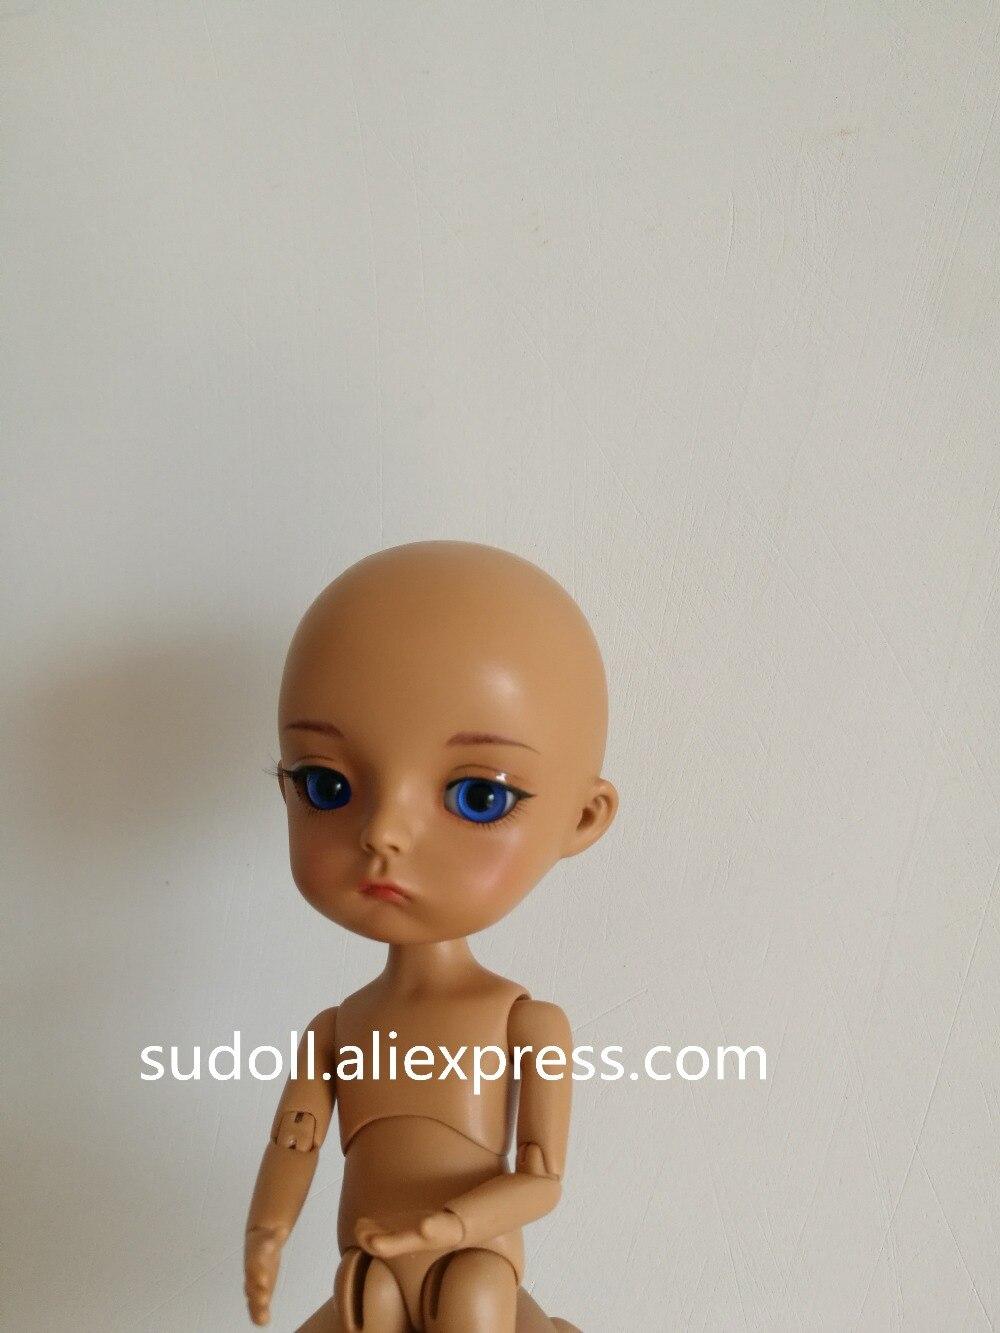 SuDoll 1/8 BJD Doll BJD/SD Fashion Cute Doll Tan colour кукла bjd dc doll chateau 6 bjd sd doll zora soom volks